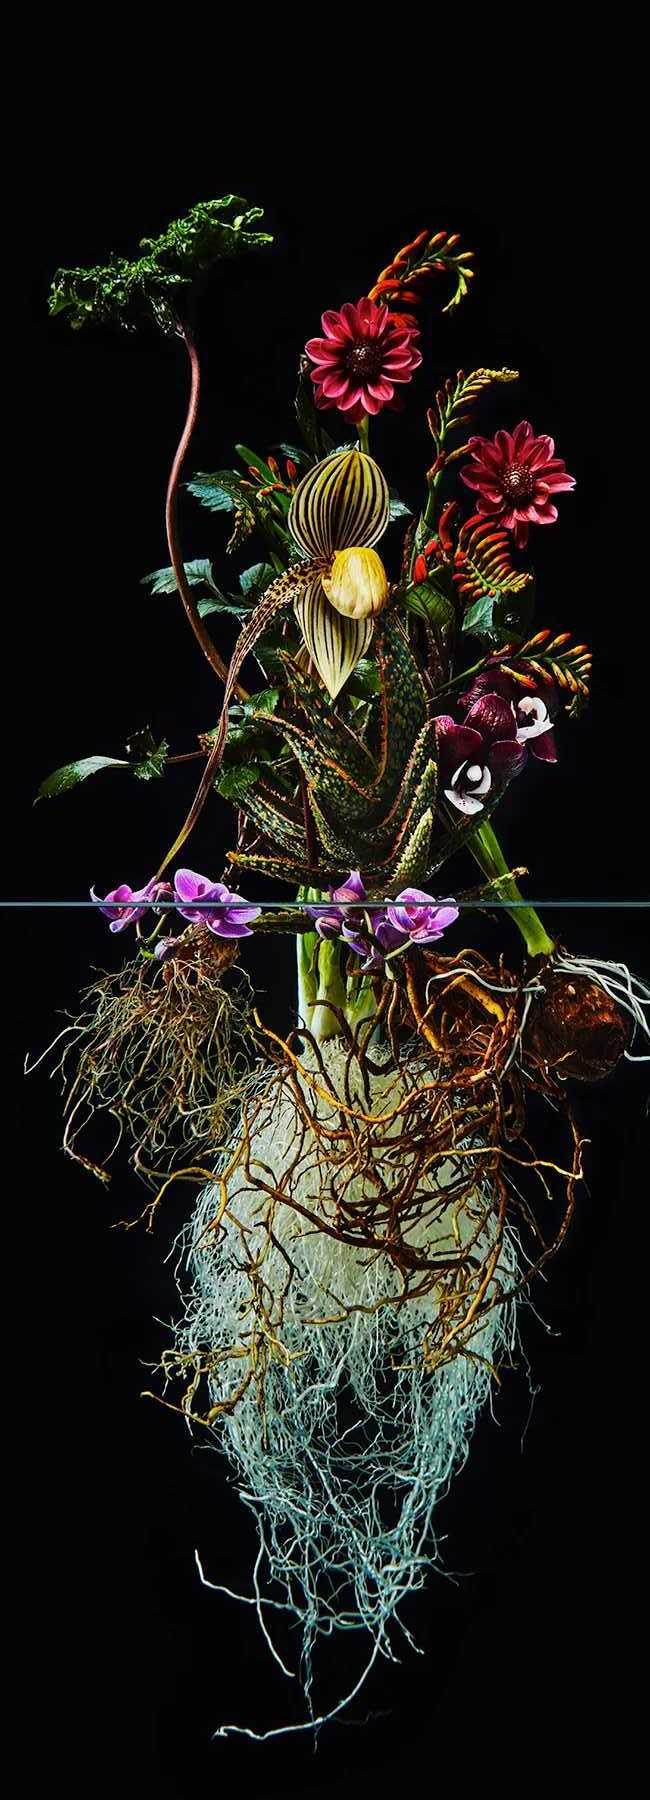 Pairfum London Azuma Makoto Undersurface Flower Root Fragrance 11